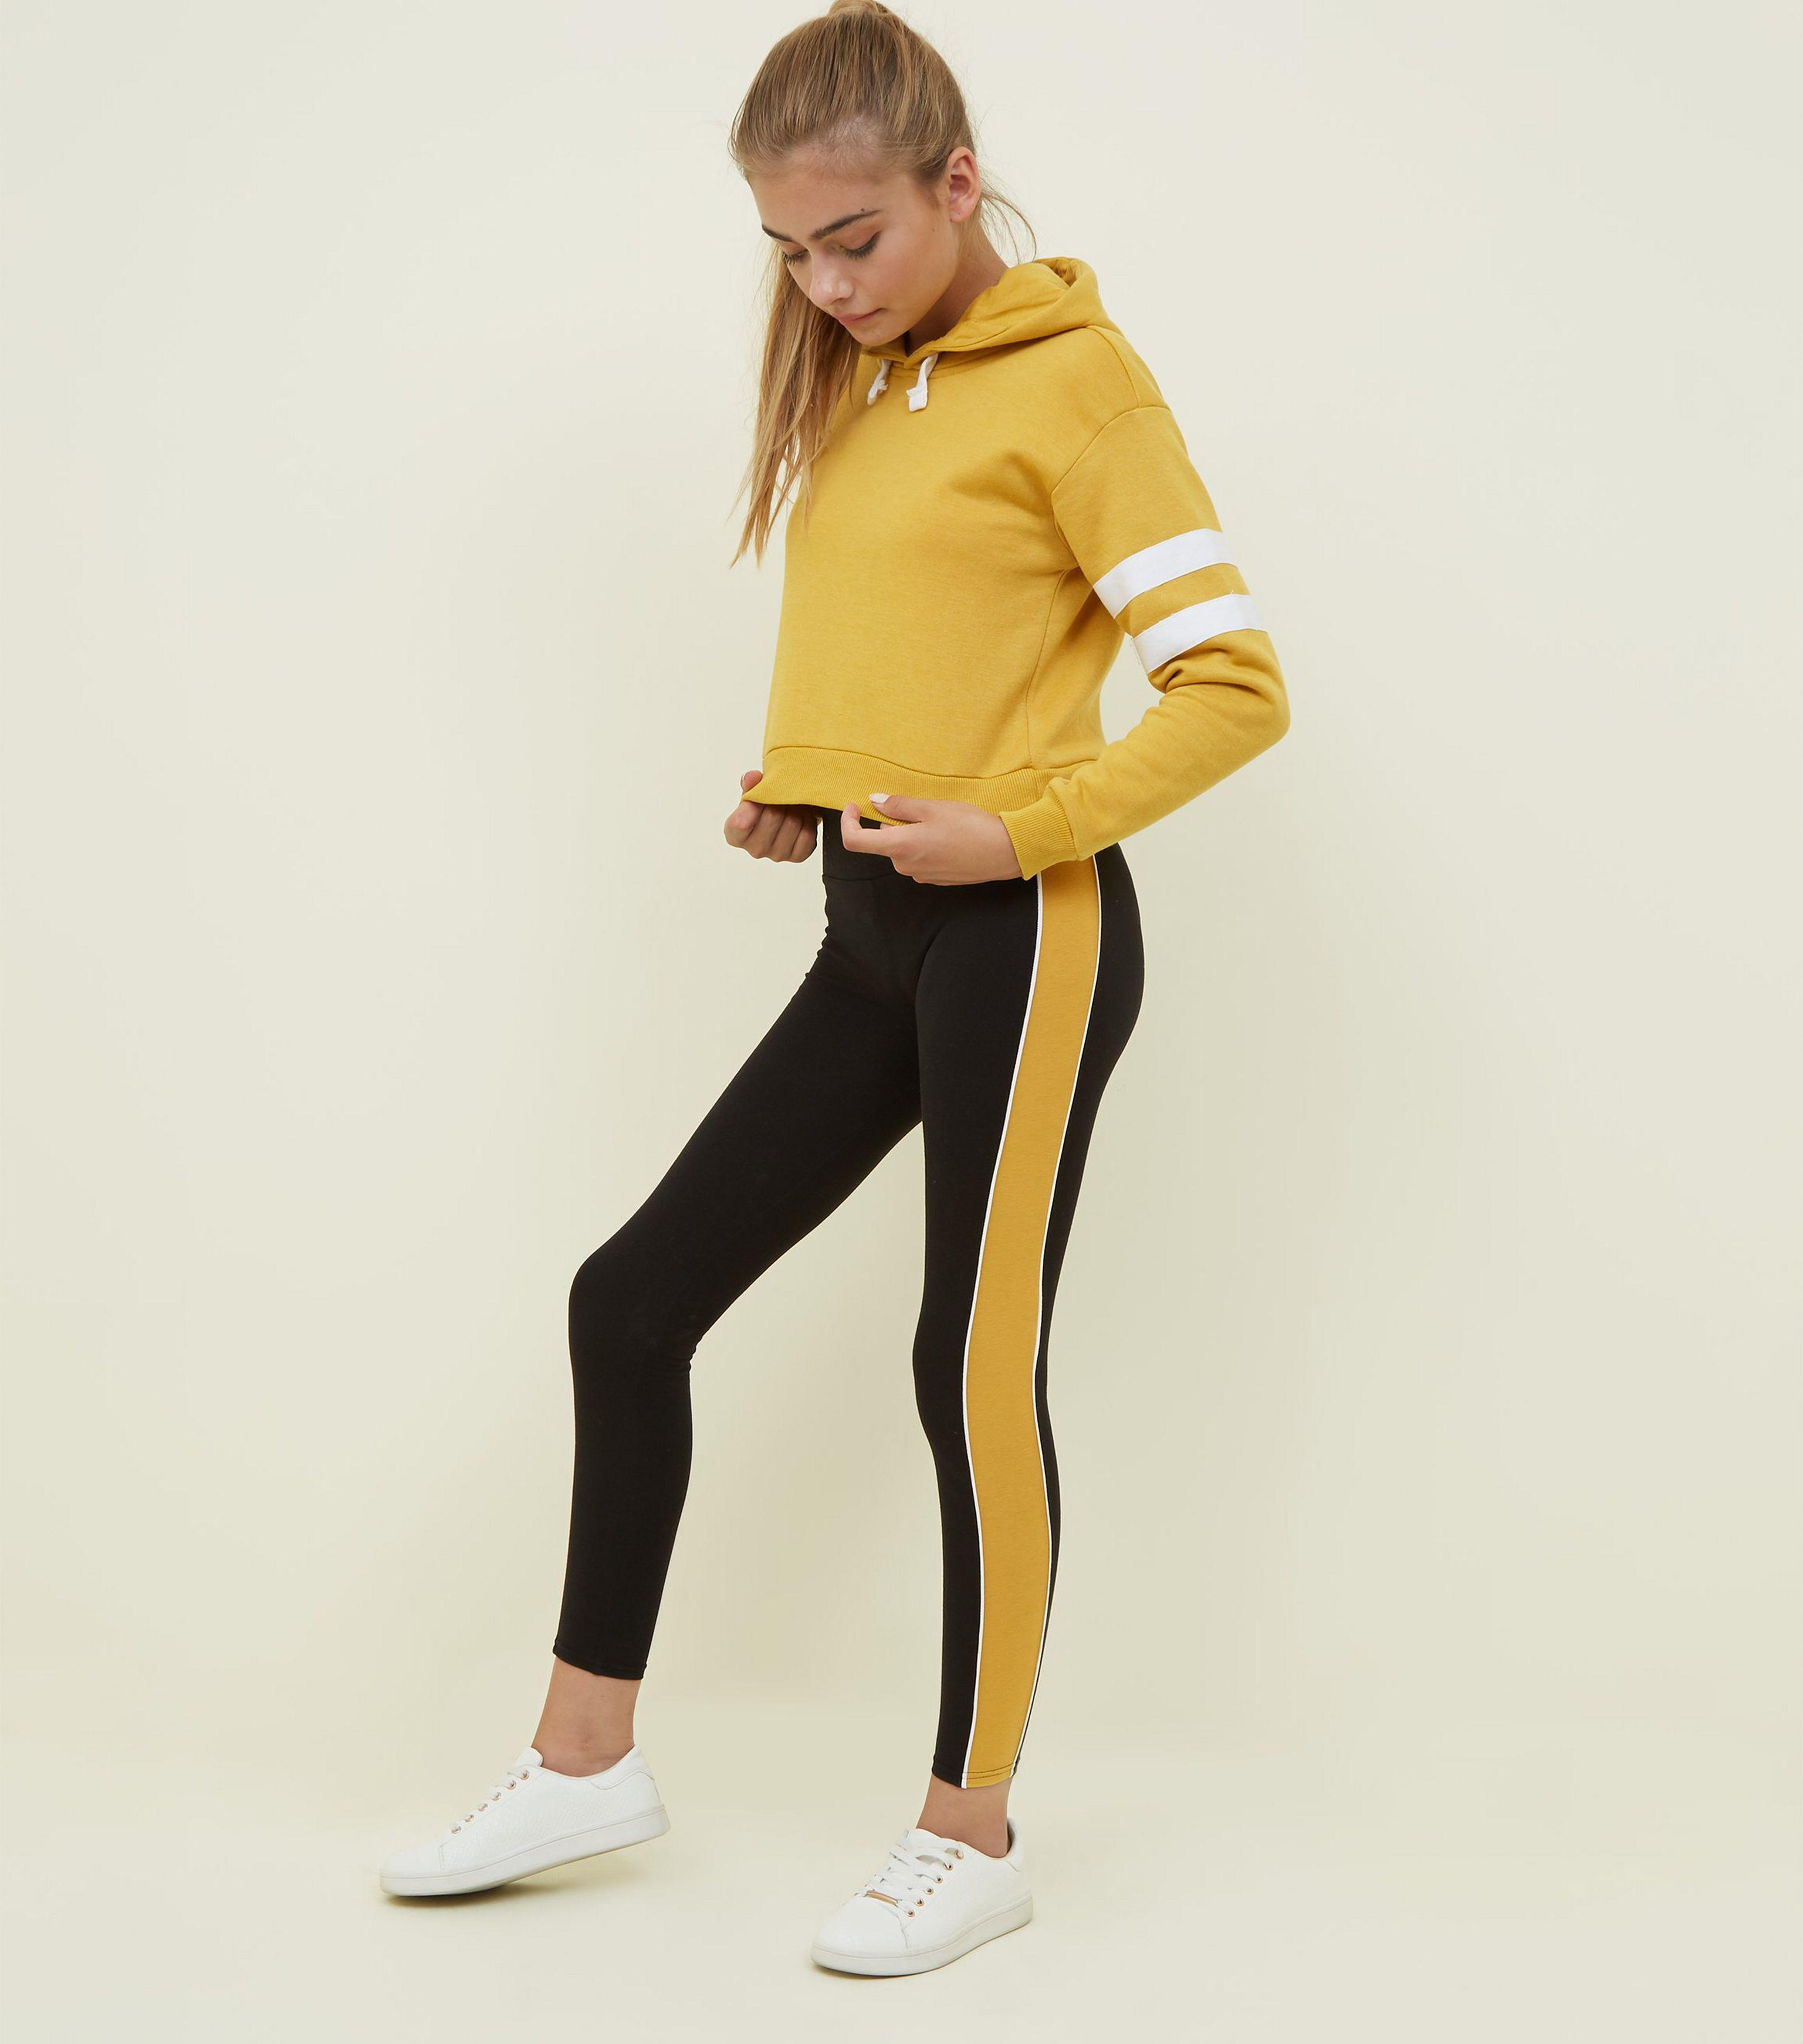 eab6feca865e New Look Girls Mustard And Black Side Stripe Leggings in Yellow - Lyst